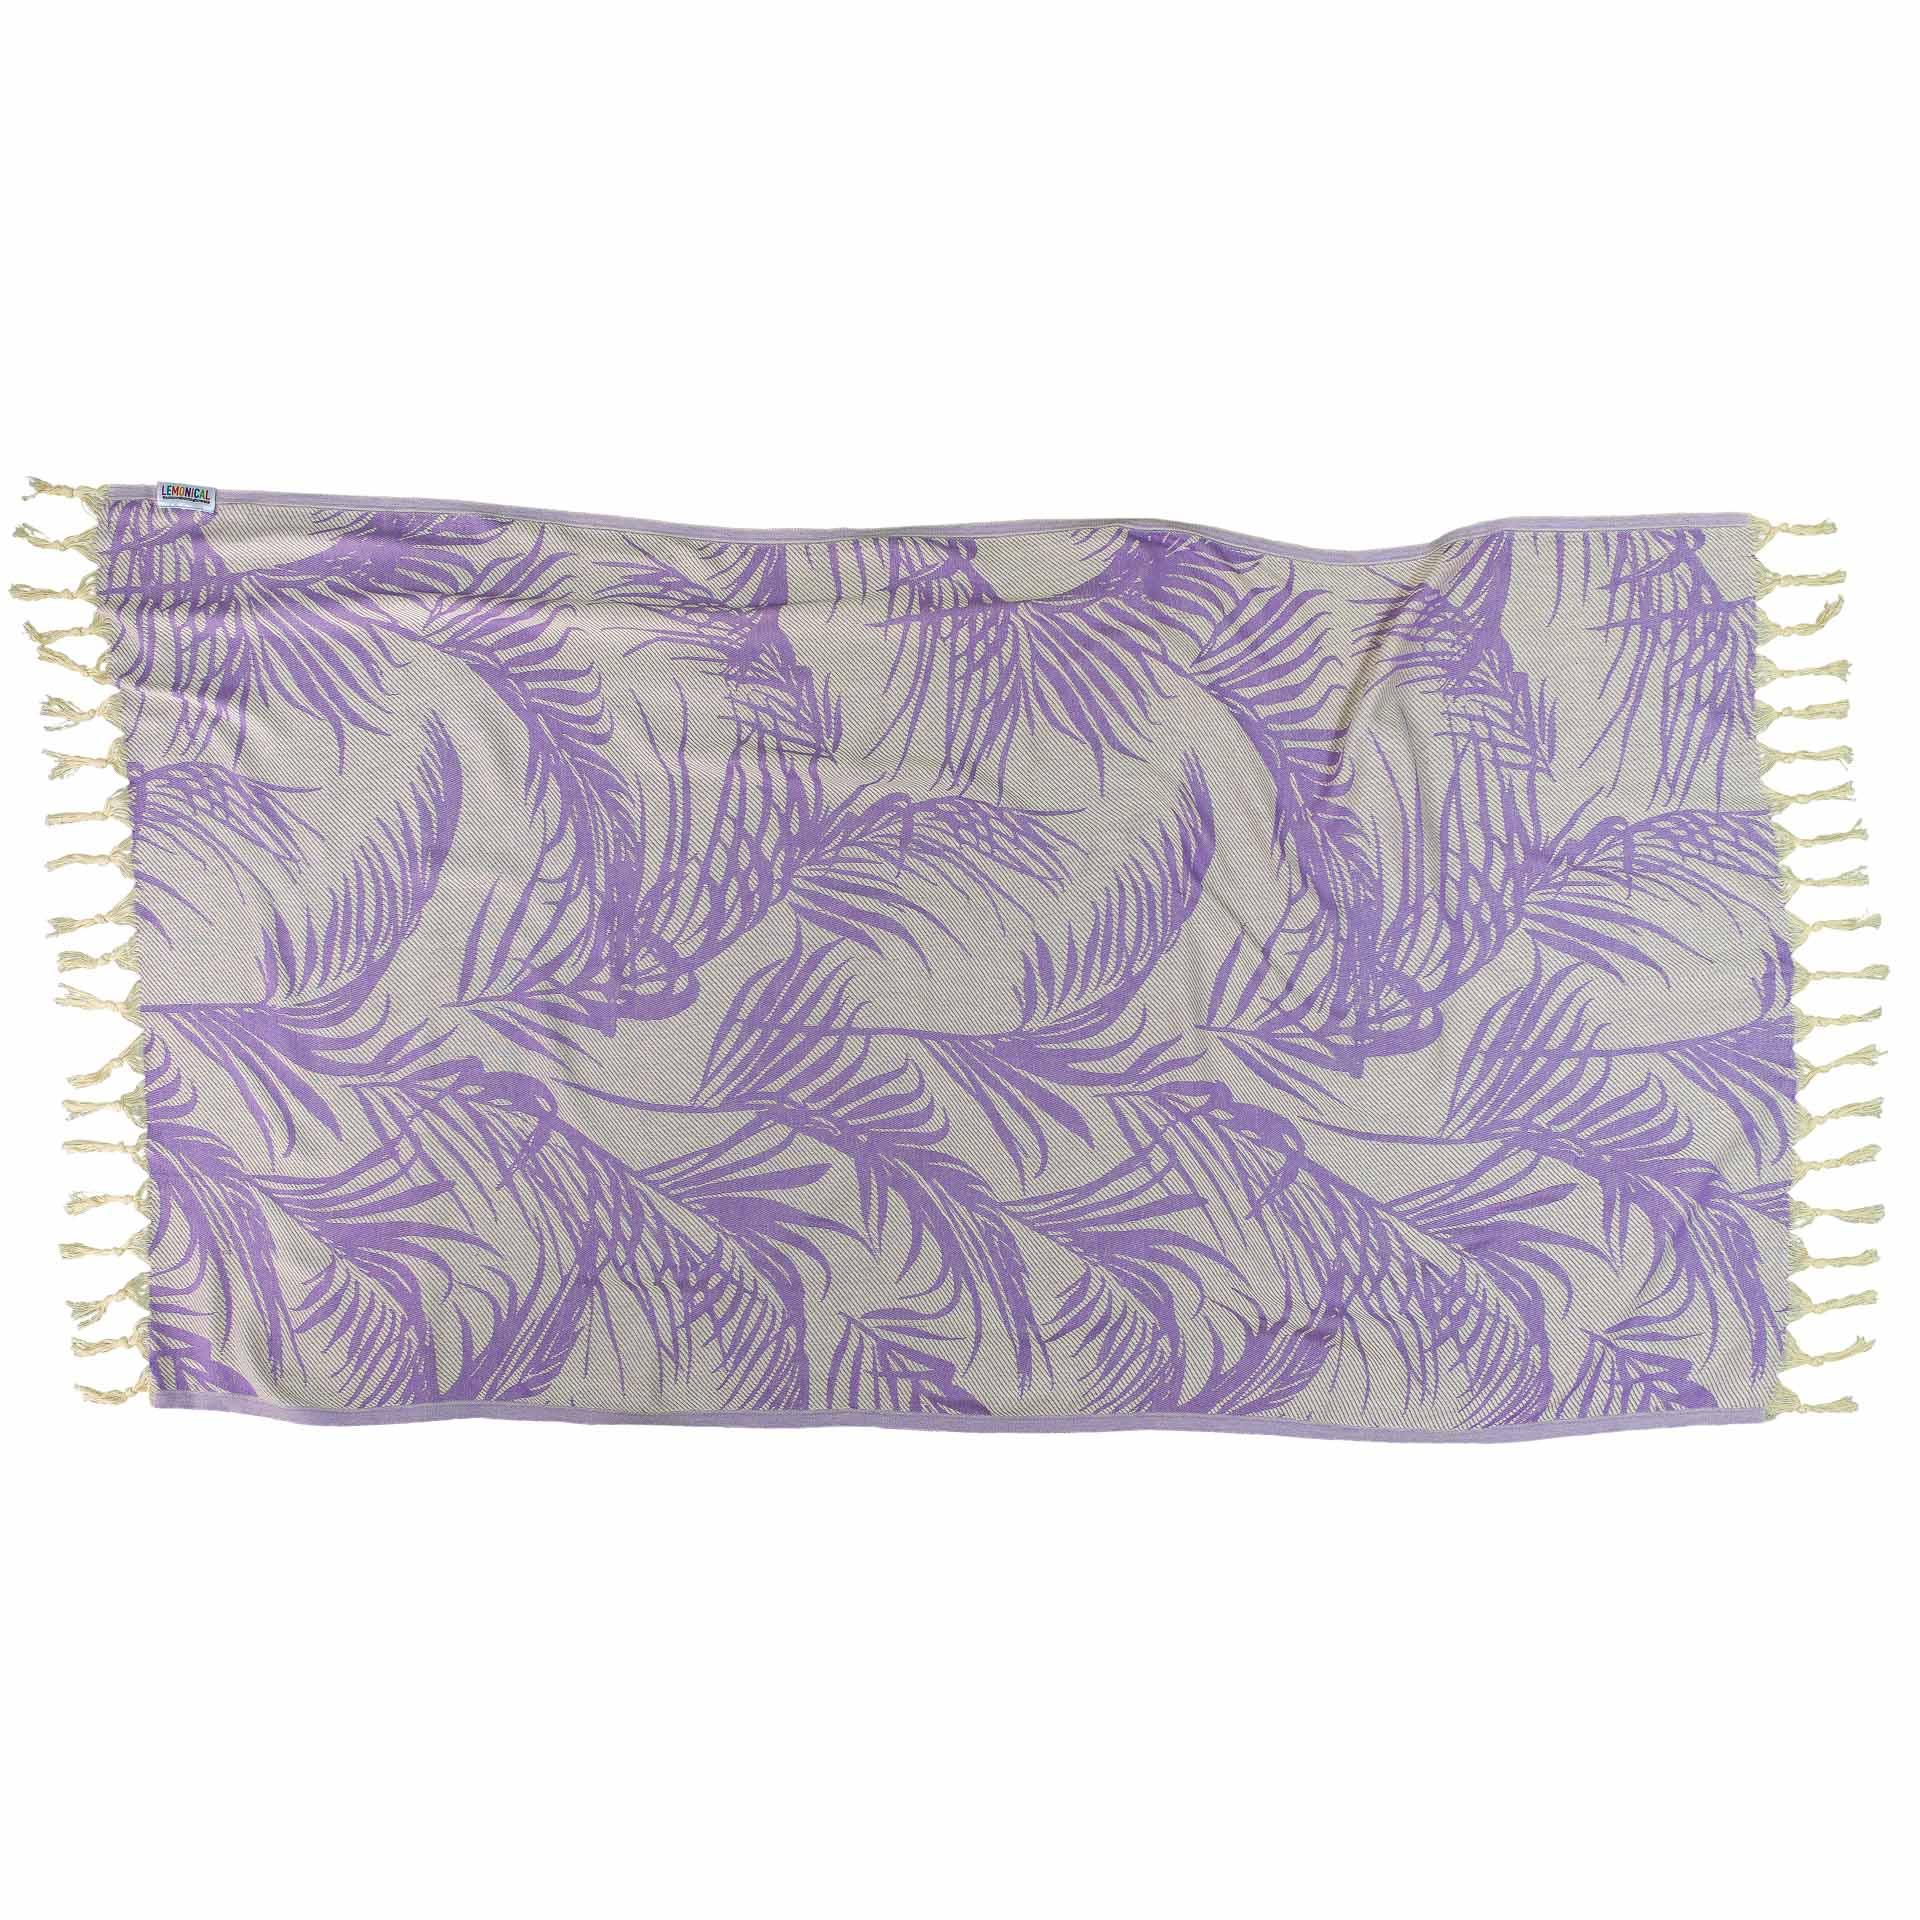 LILAC FEATHER-Towel-Lemonical-2